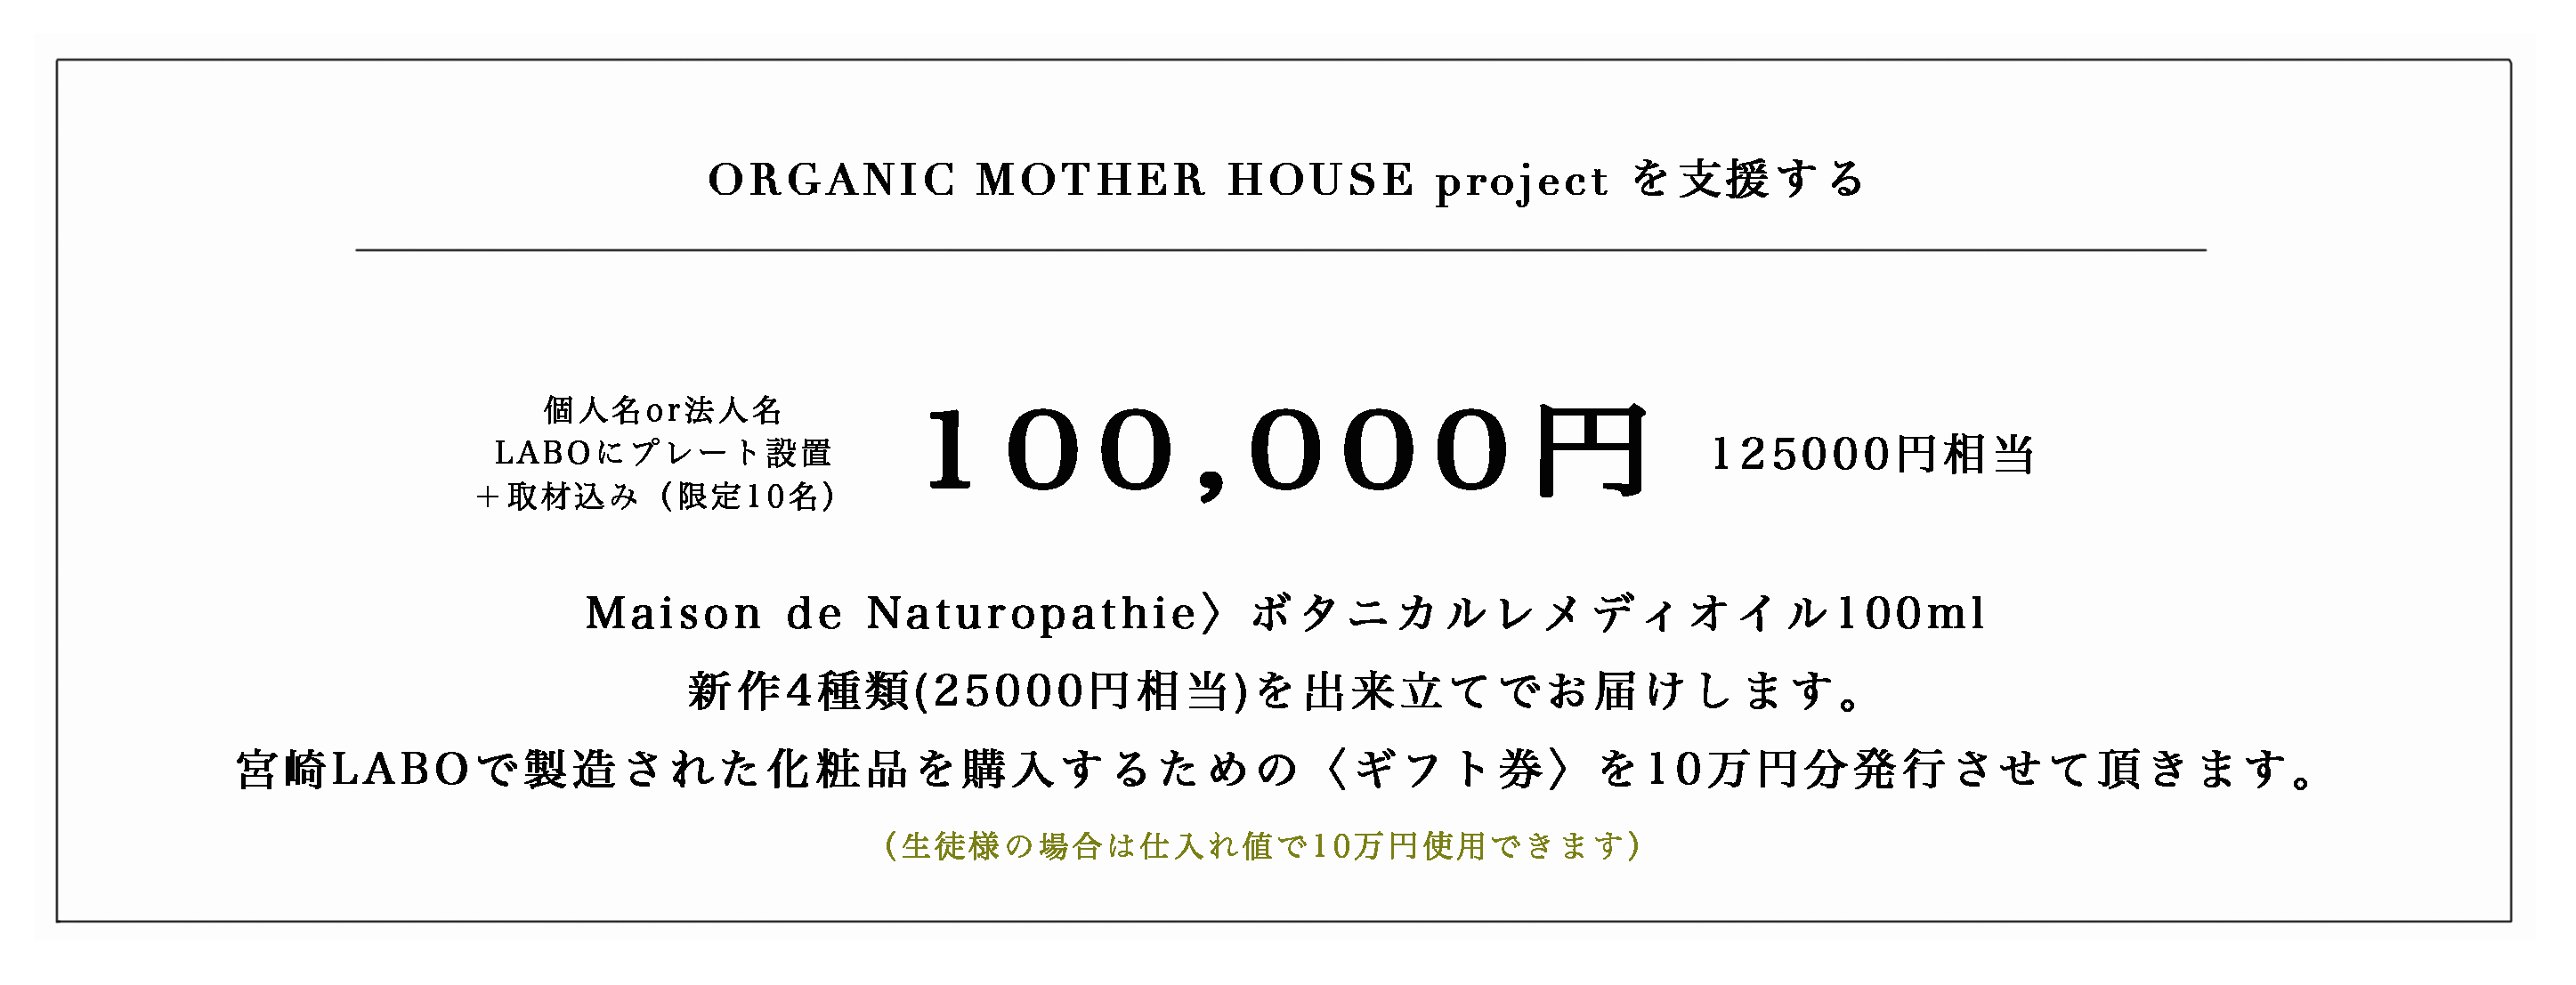 ORGANIC MOTHER HOUSE〈植物調合美容研究所〉10万3